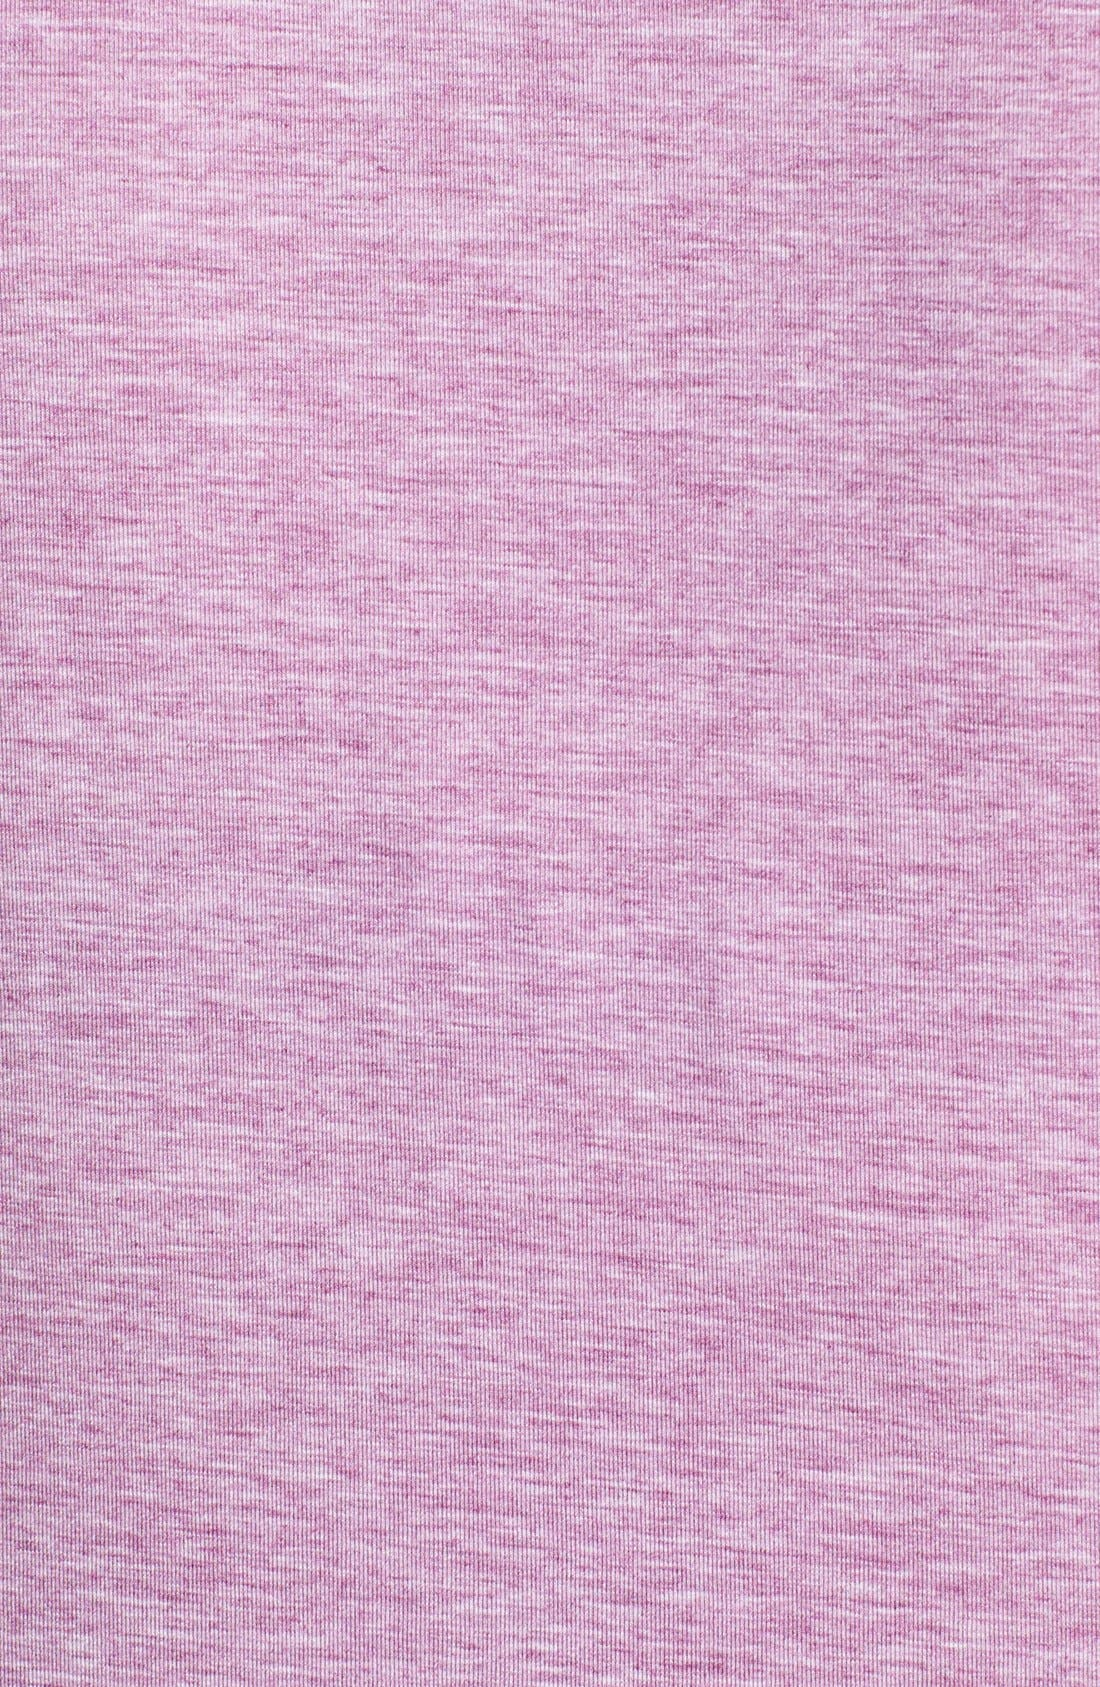 Alternate Image 3  - Moving Comfort 'Endurance' Long Sleeve Tee (Plus Size)